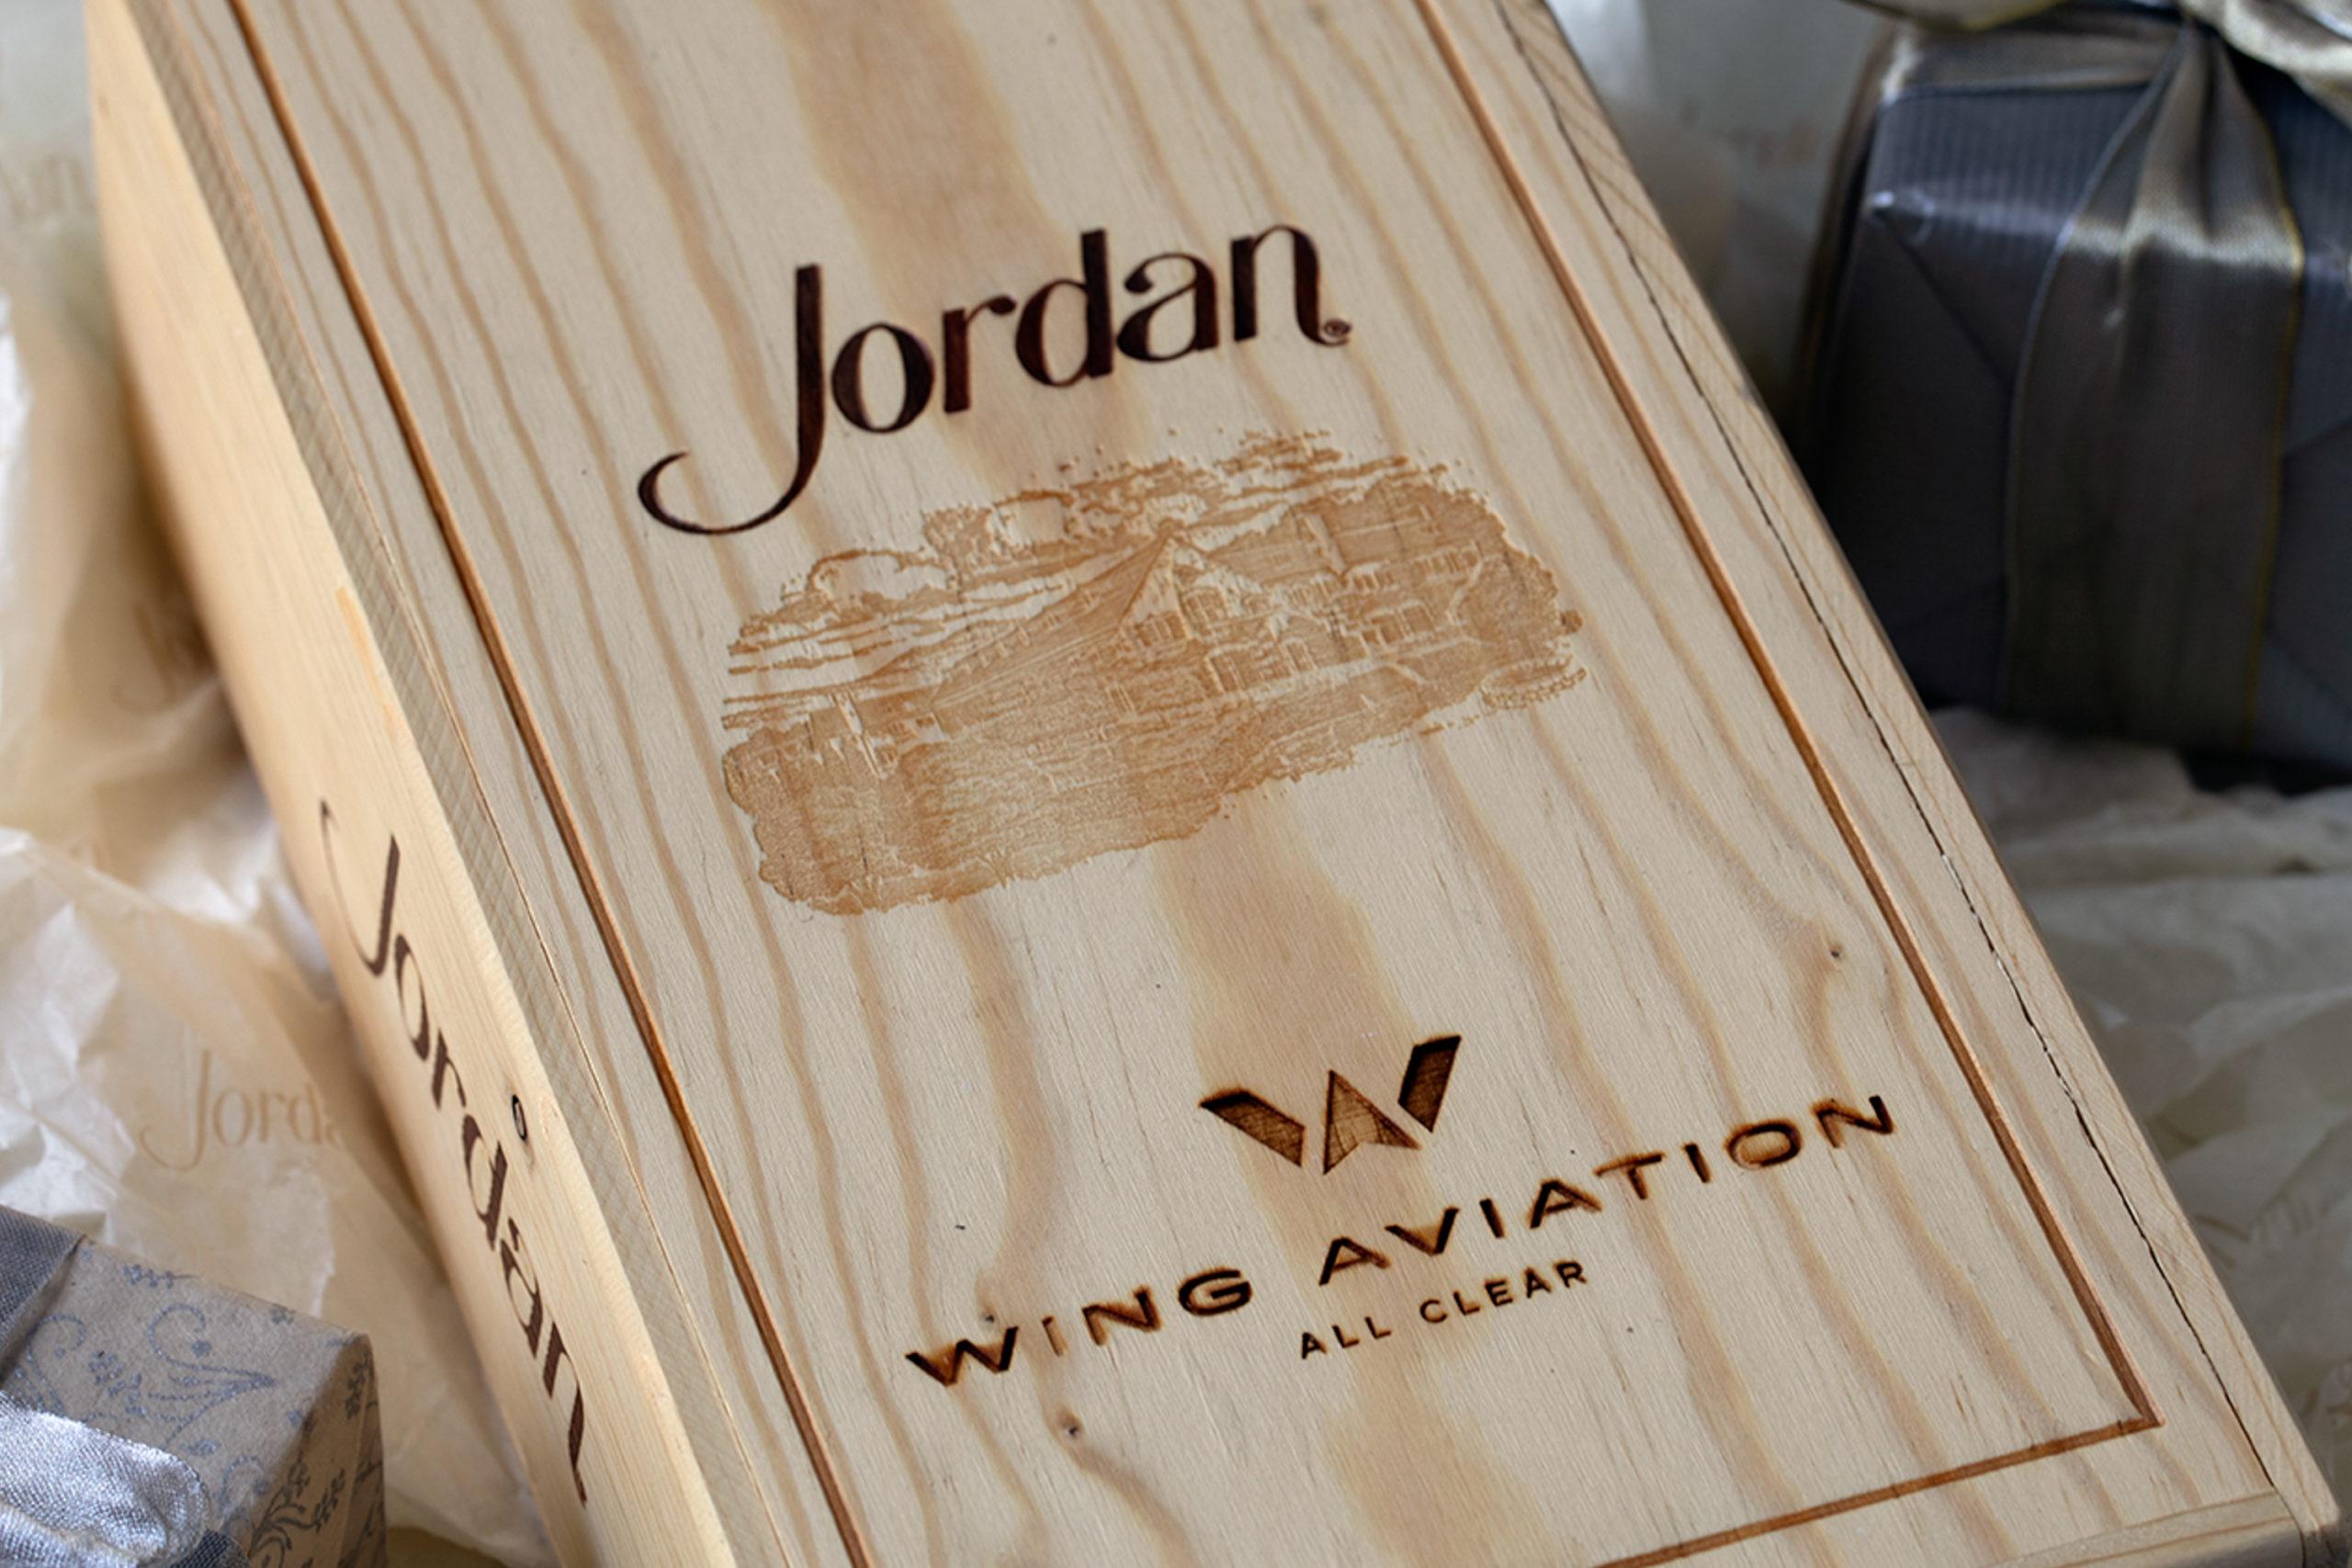 Branded wooden gift box